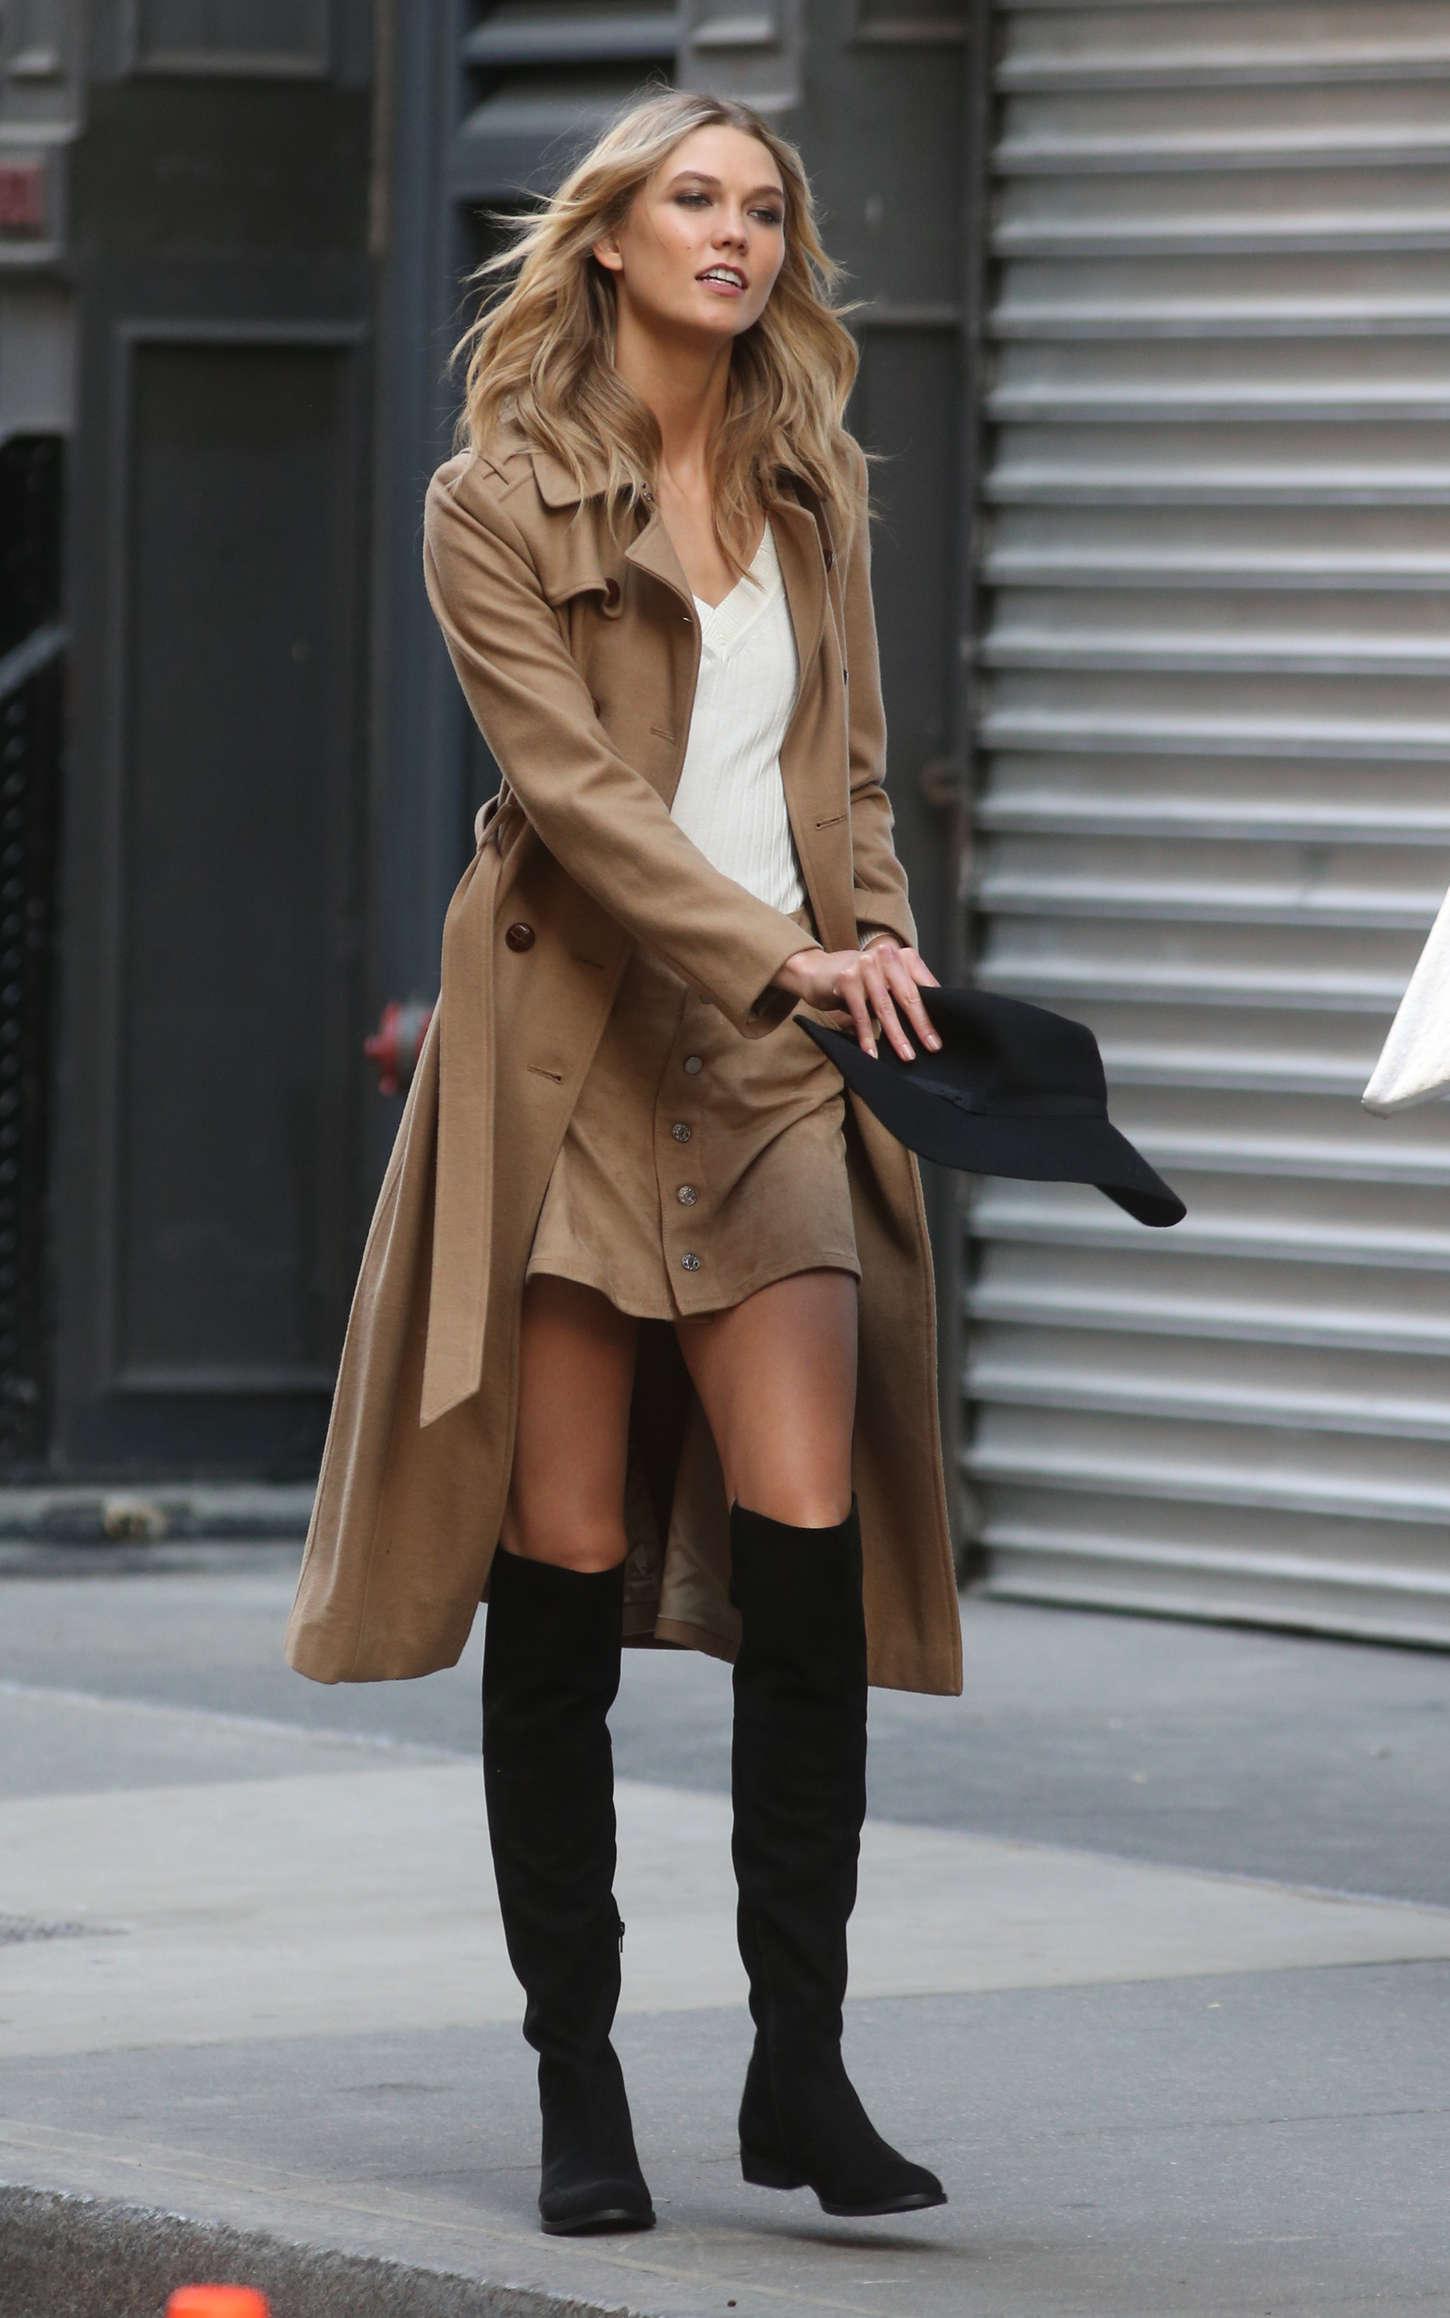 Karlie Kloss 2015 : Karlie Kloss: Photoshoot in NYC -02